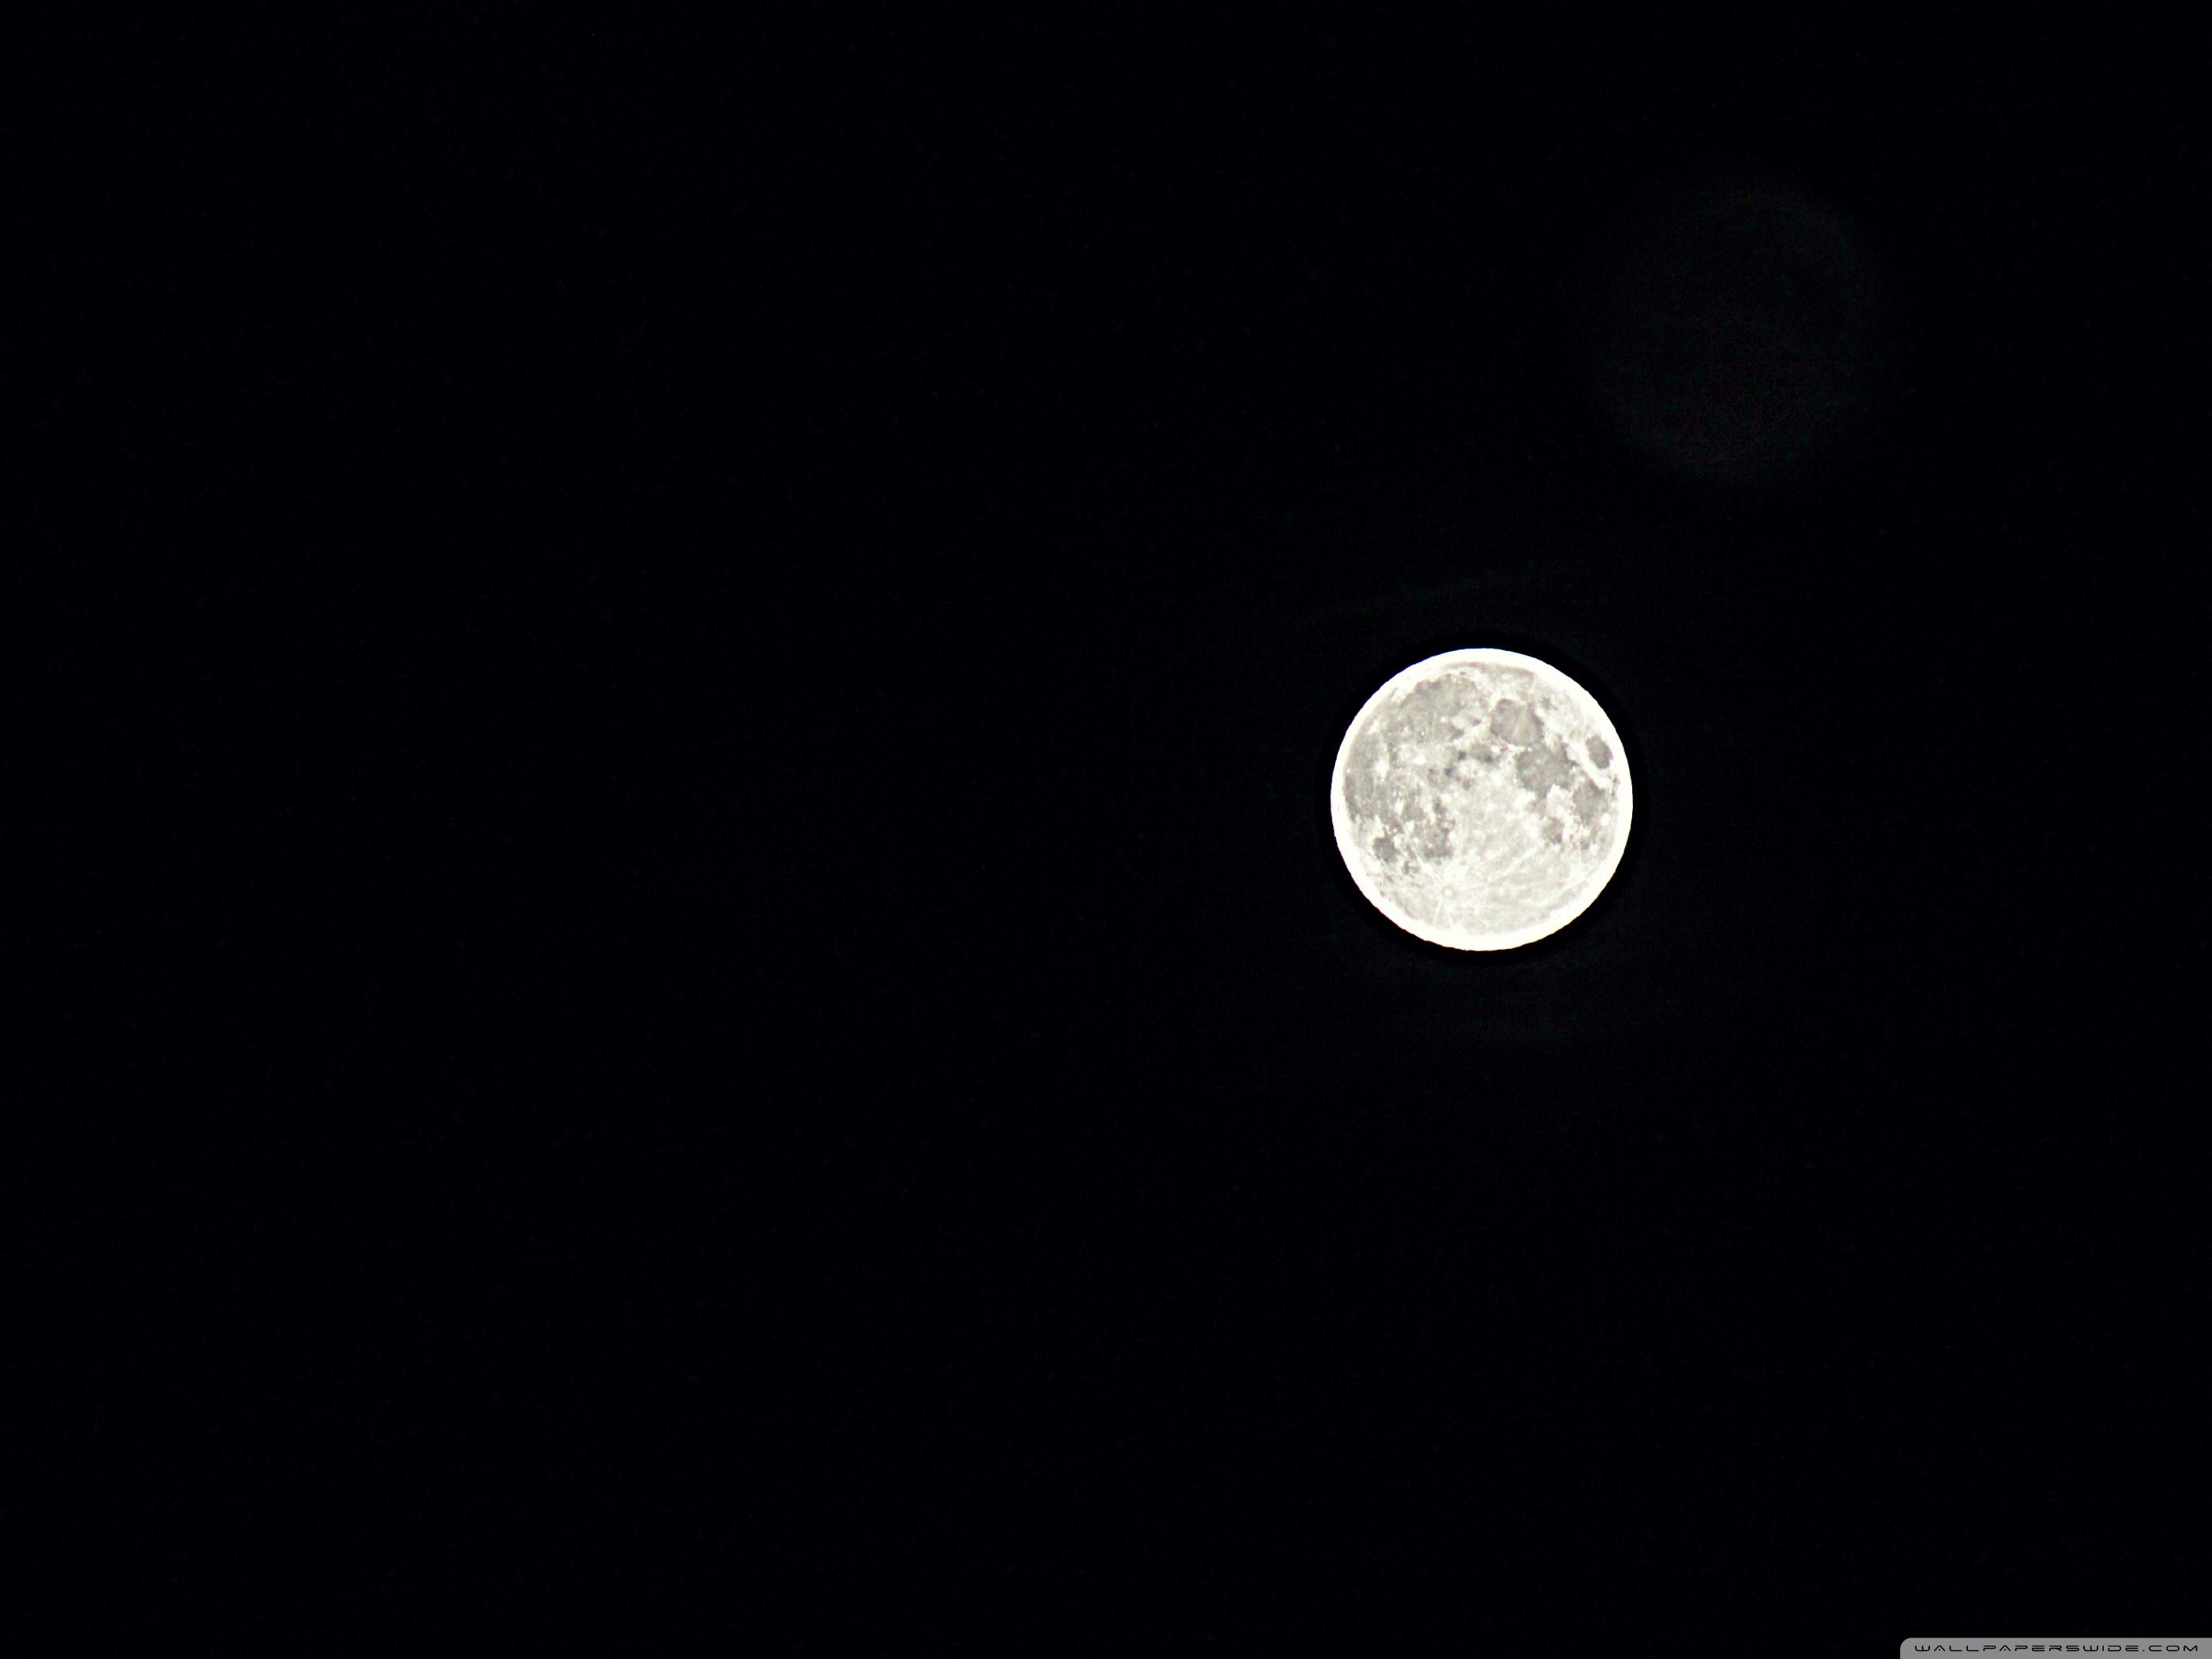 nasa night sky mezza luna - photo #35